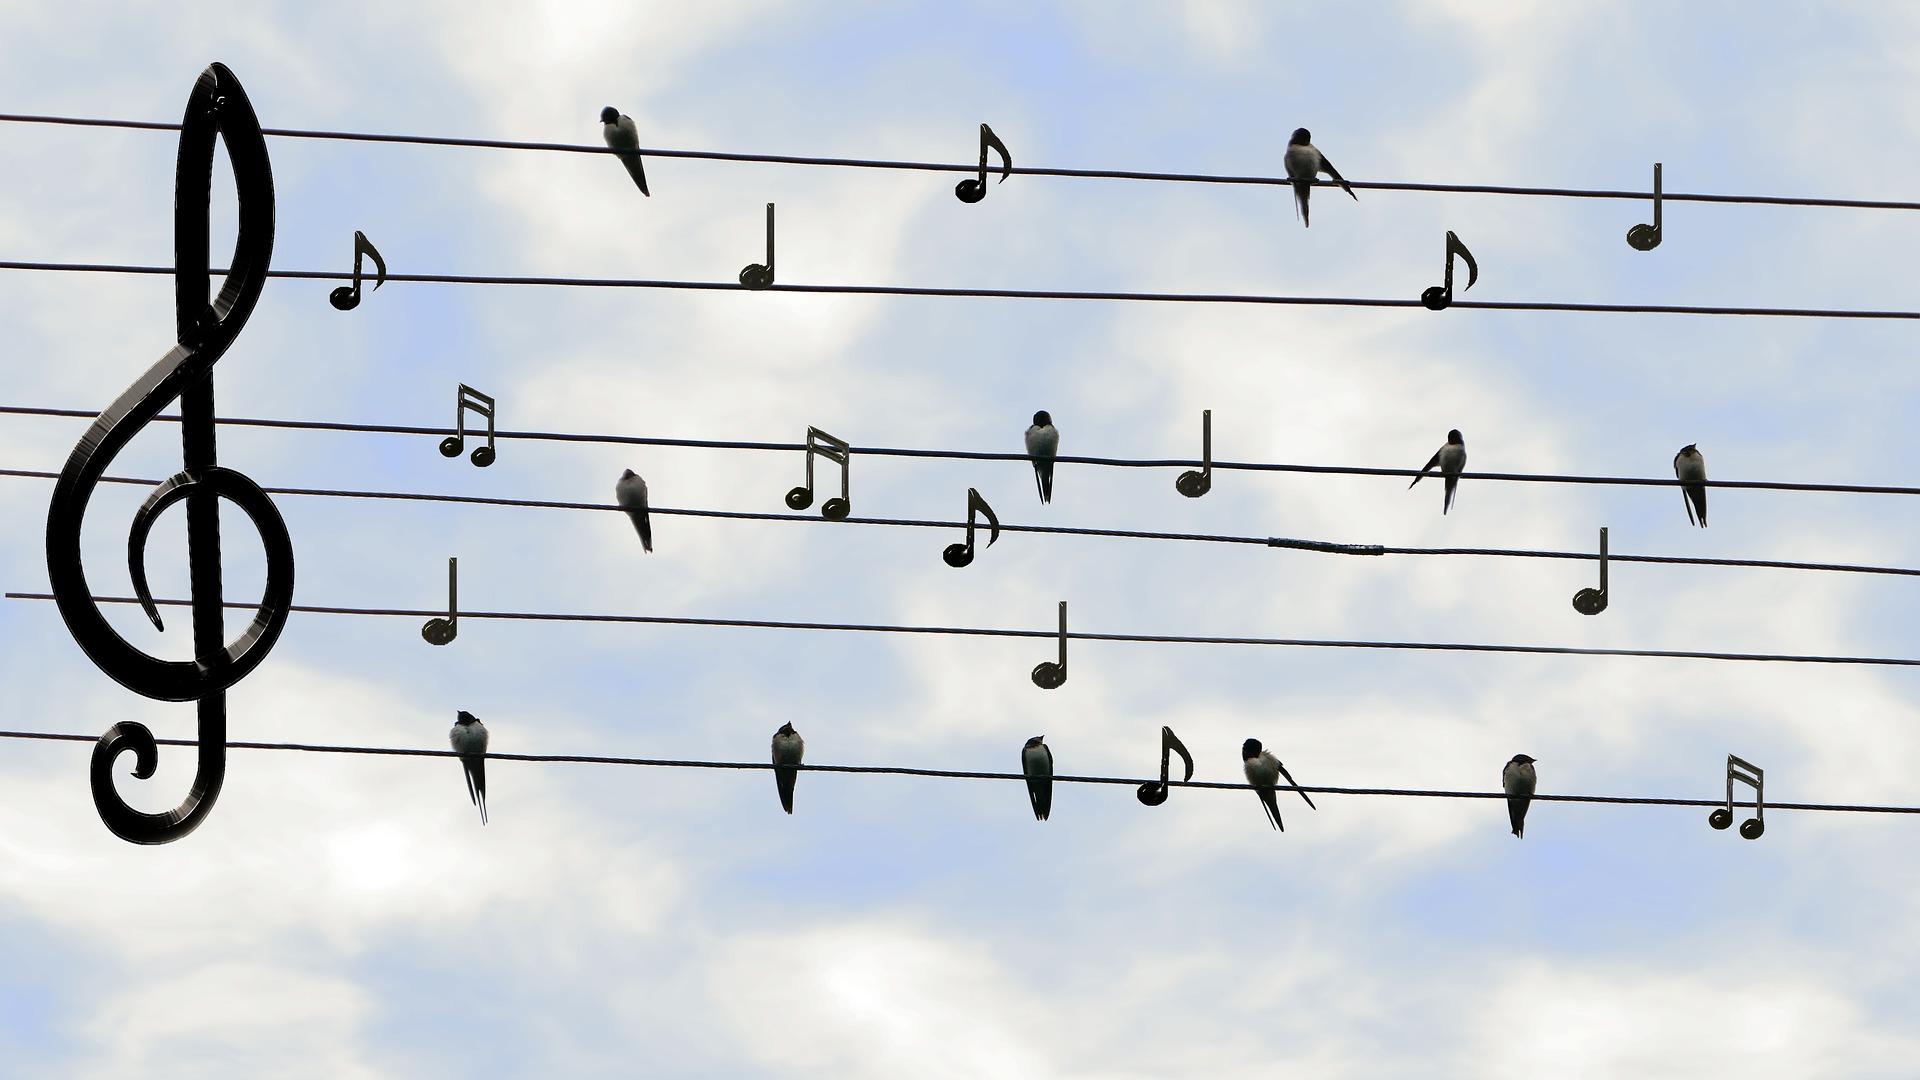 Muzieknoten leren lezen – Mini-cursus, deel 1